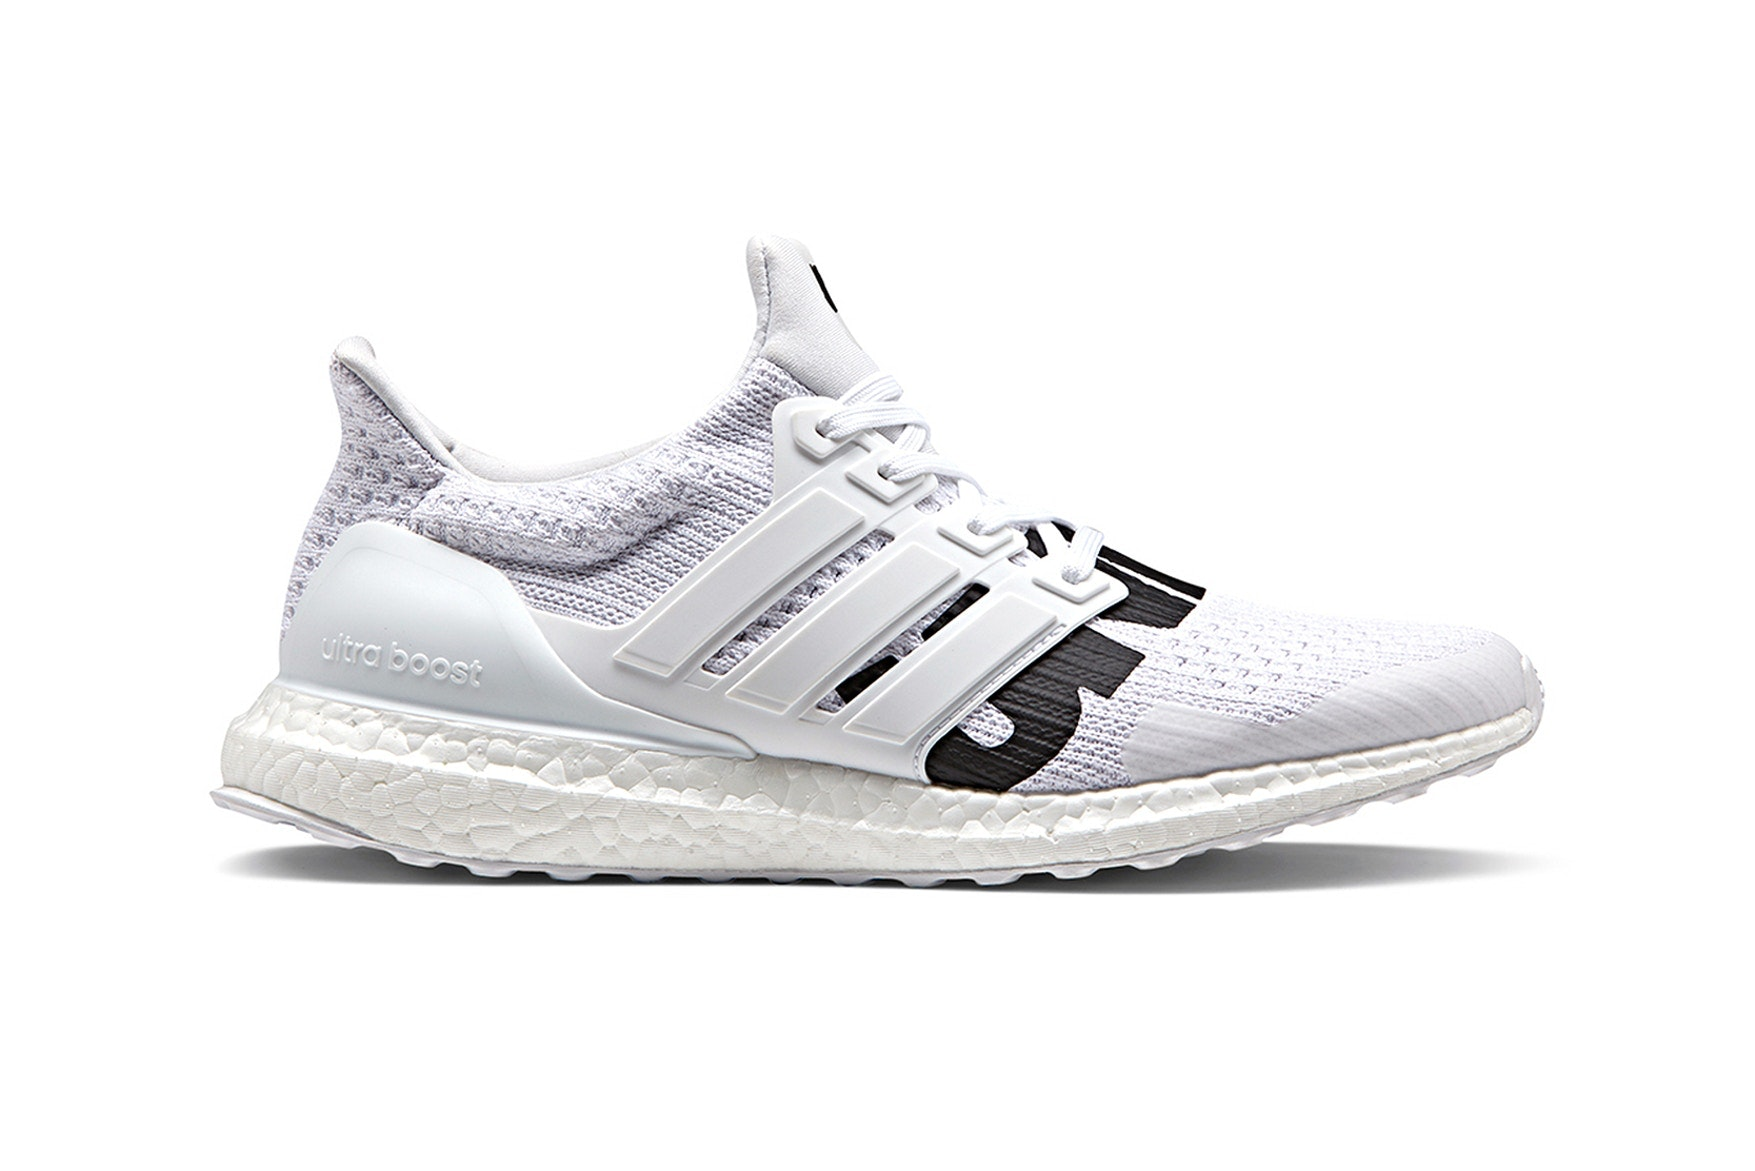 adidas Ultra Boost 4.0 UNDFTD White